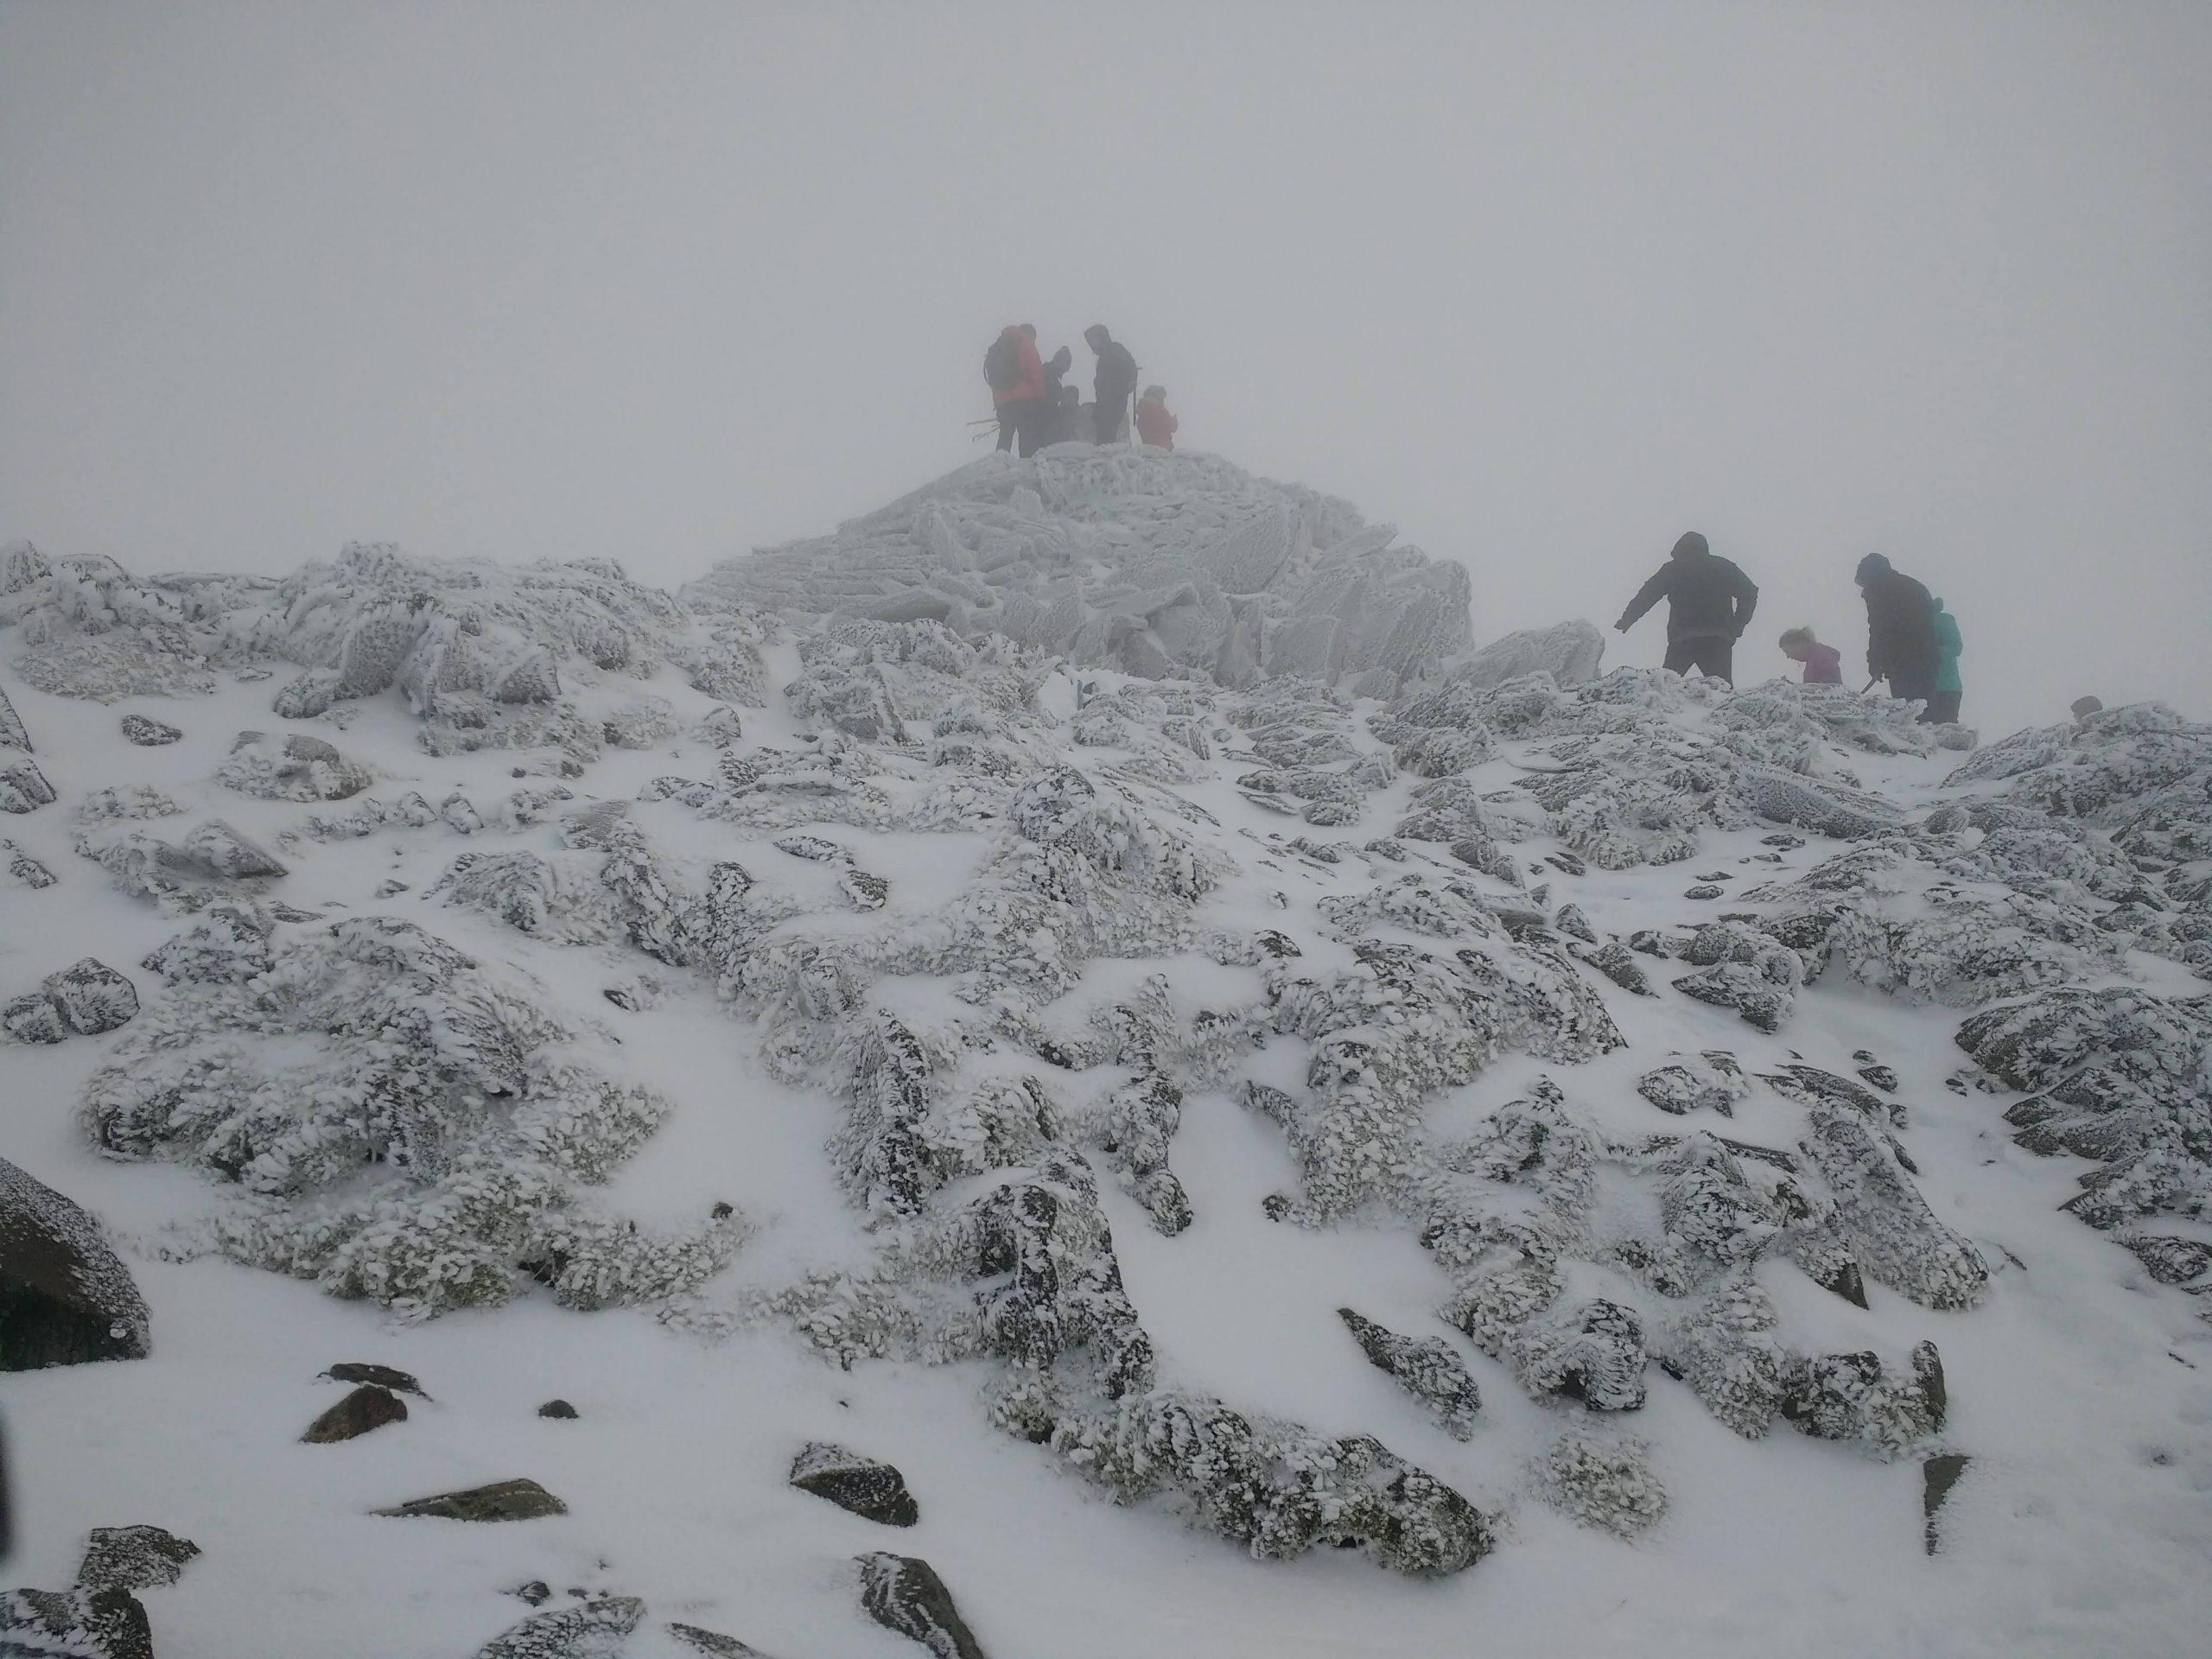 Mount Snowdon summit in winter